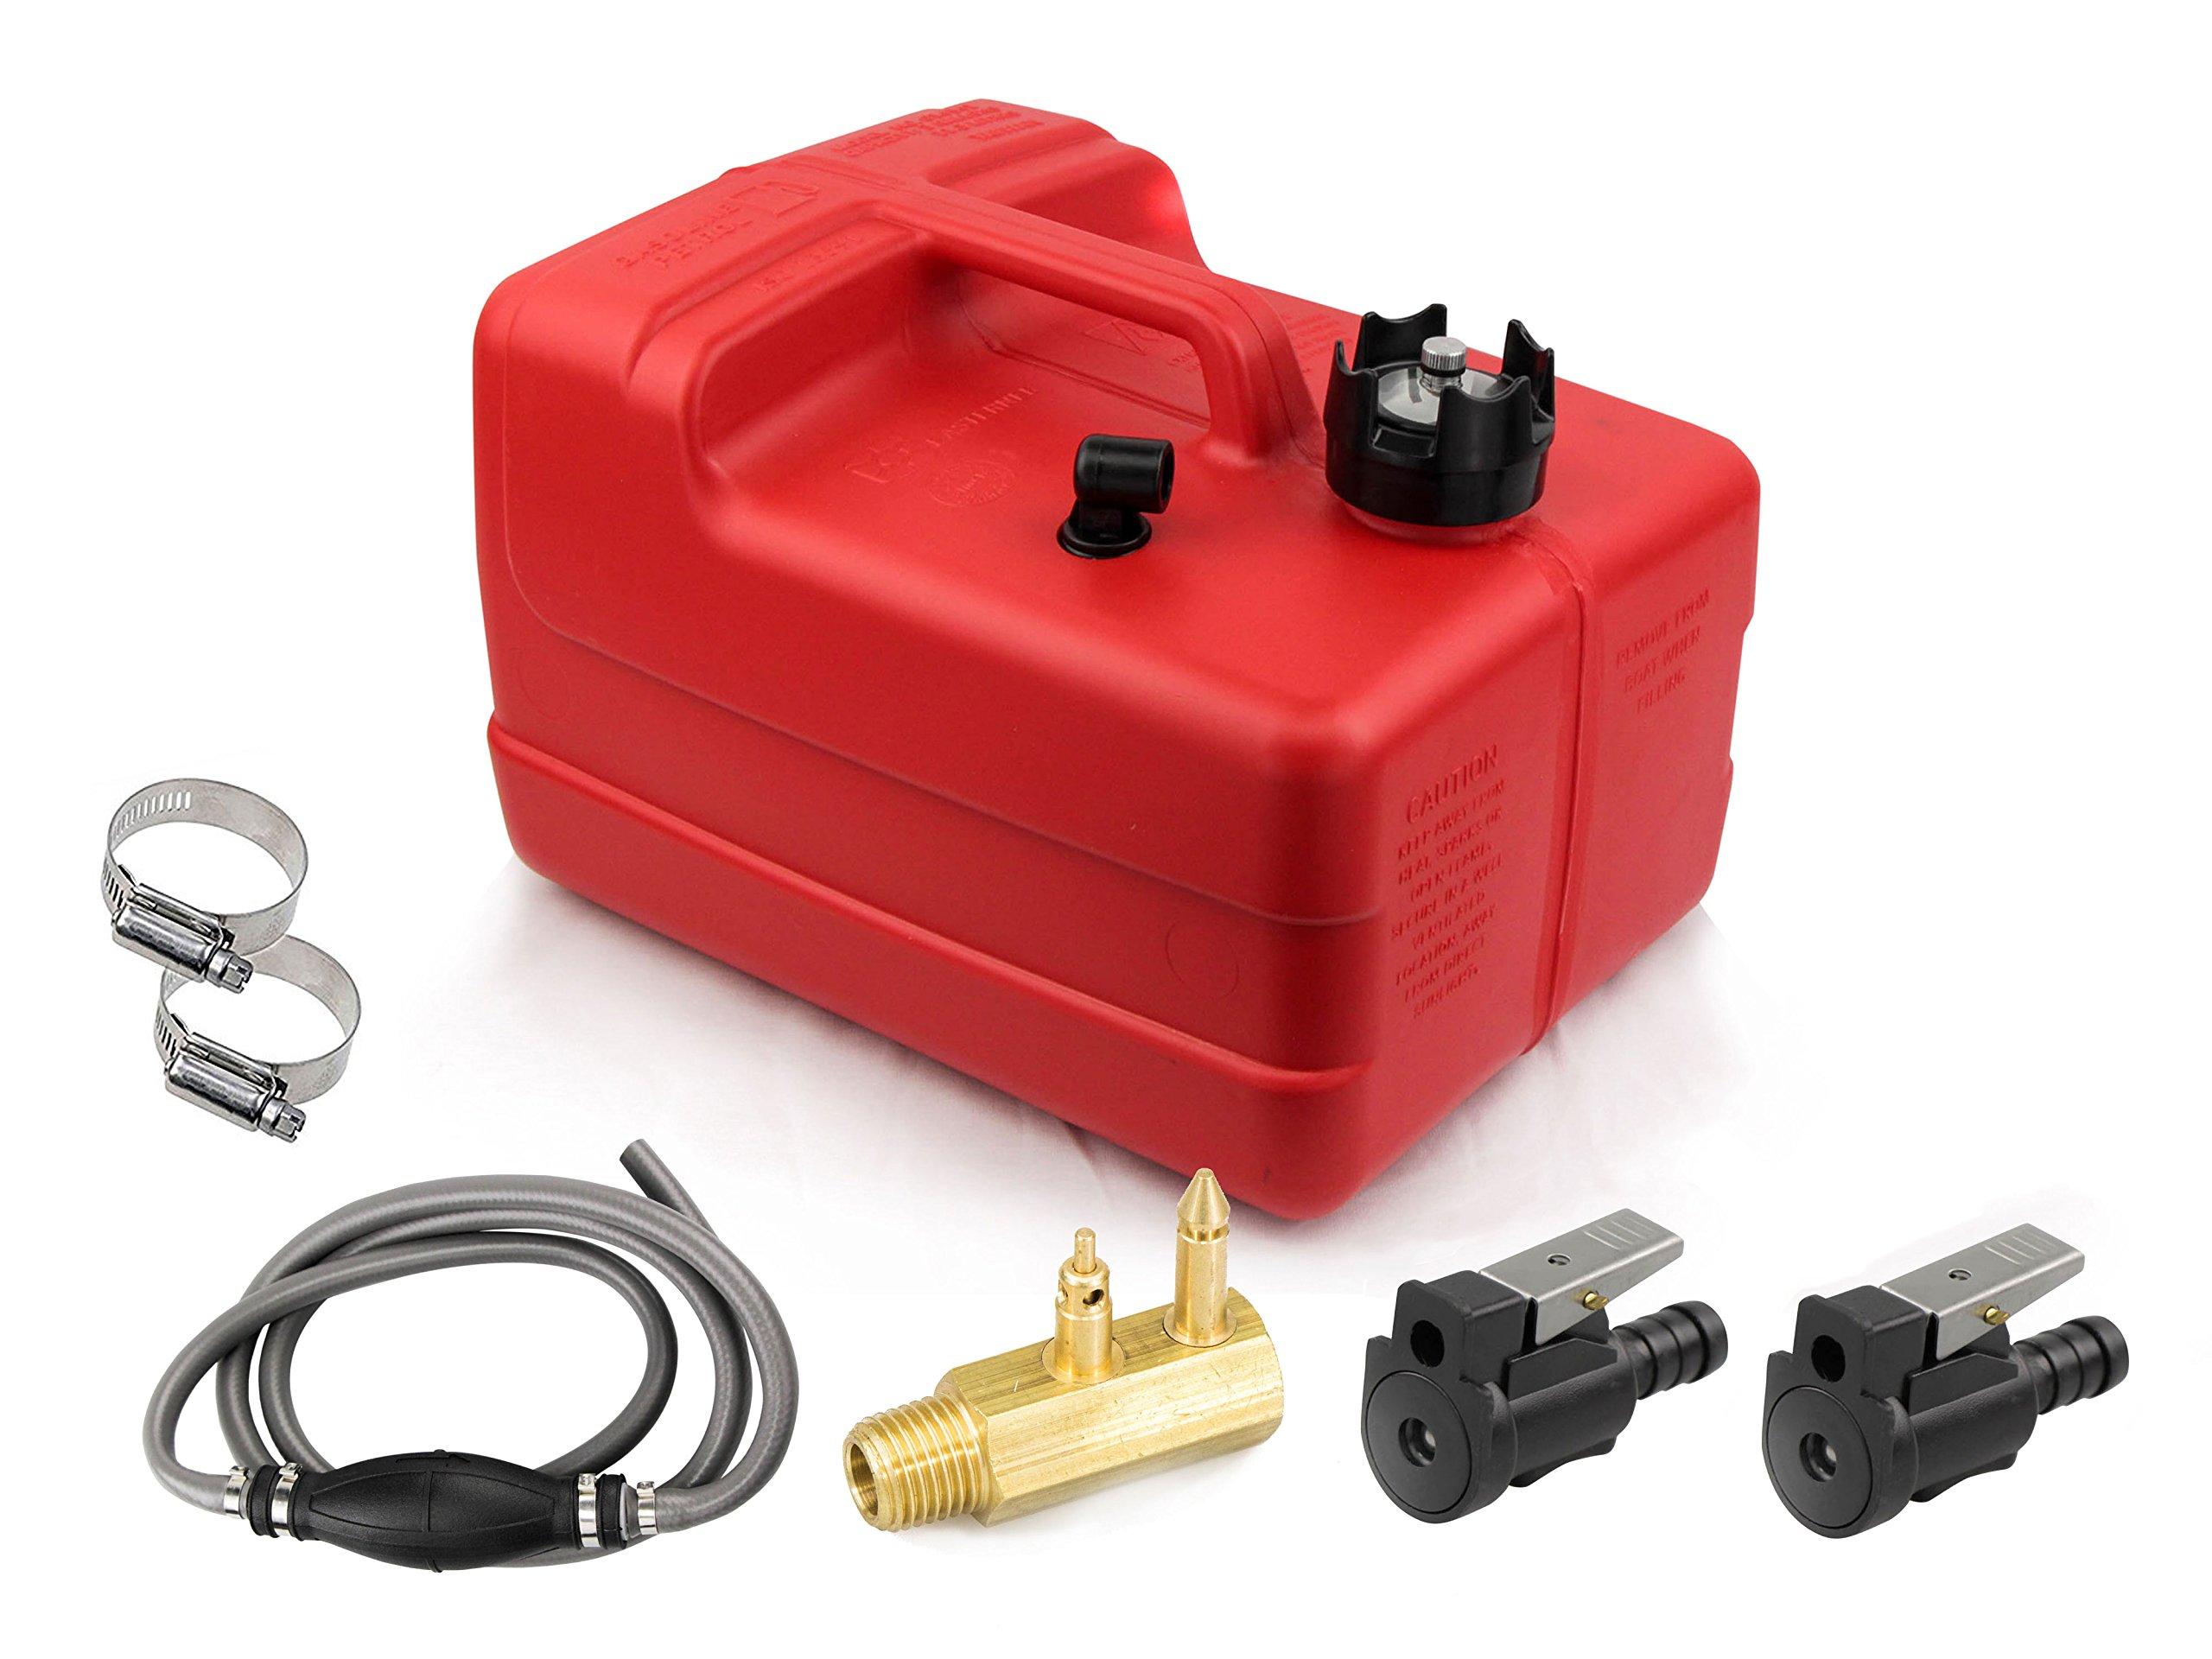 Five Oceans 3 Gallon Fuel Tank/Portable Kit (5/16'' Omc - Johnson - Evinrude)